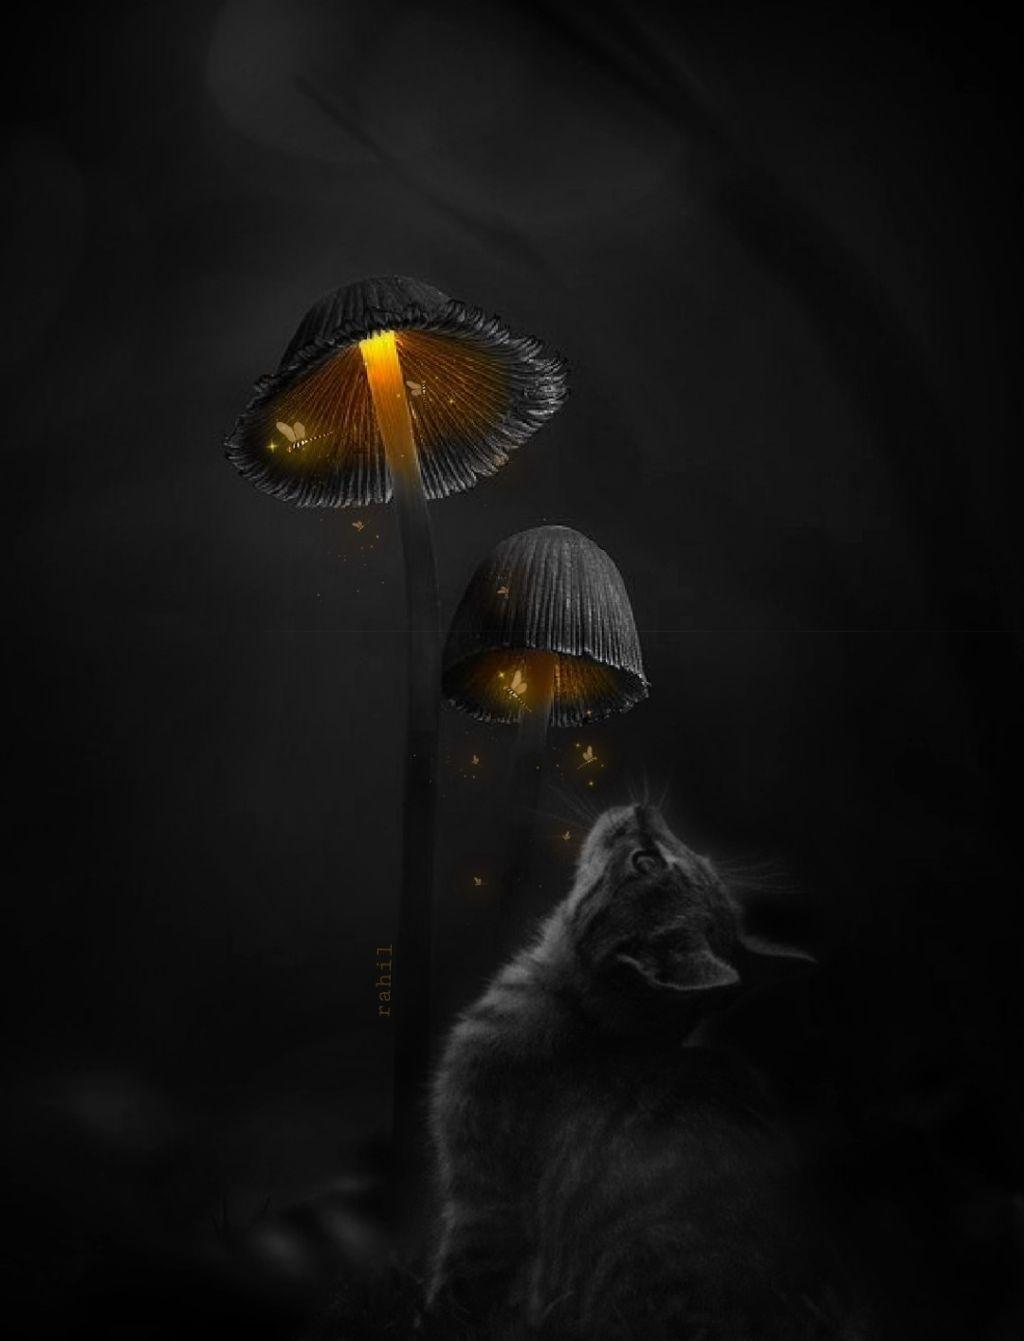 🖤 There is always a light....😊   #freetoedit #doubleexposure #myedit #madewithpicsart #editedbyme #madewithlove #loveediting #surealism #dreamy #cat #animal #lightinthedark  #neverstopdreaming #interesting  #blackandwhite #colorsplash #darkness #darkart #magical  #blackandwhitelover #editstepbystep  Thanks for the great sticker